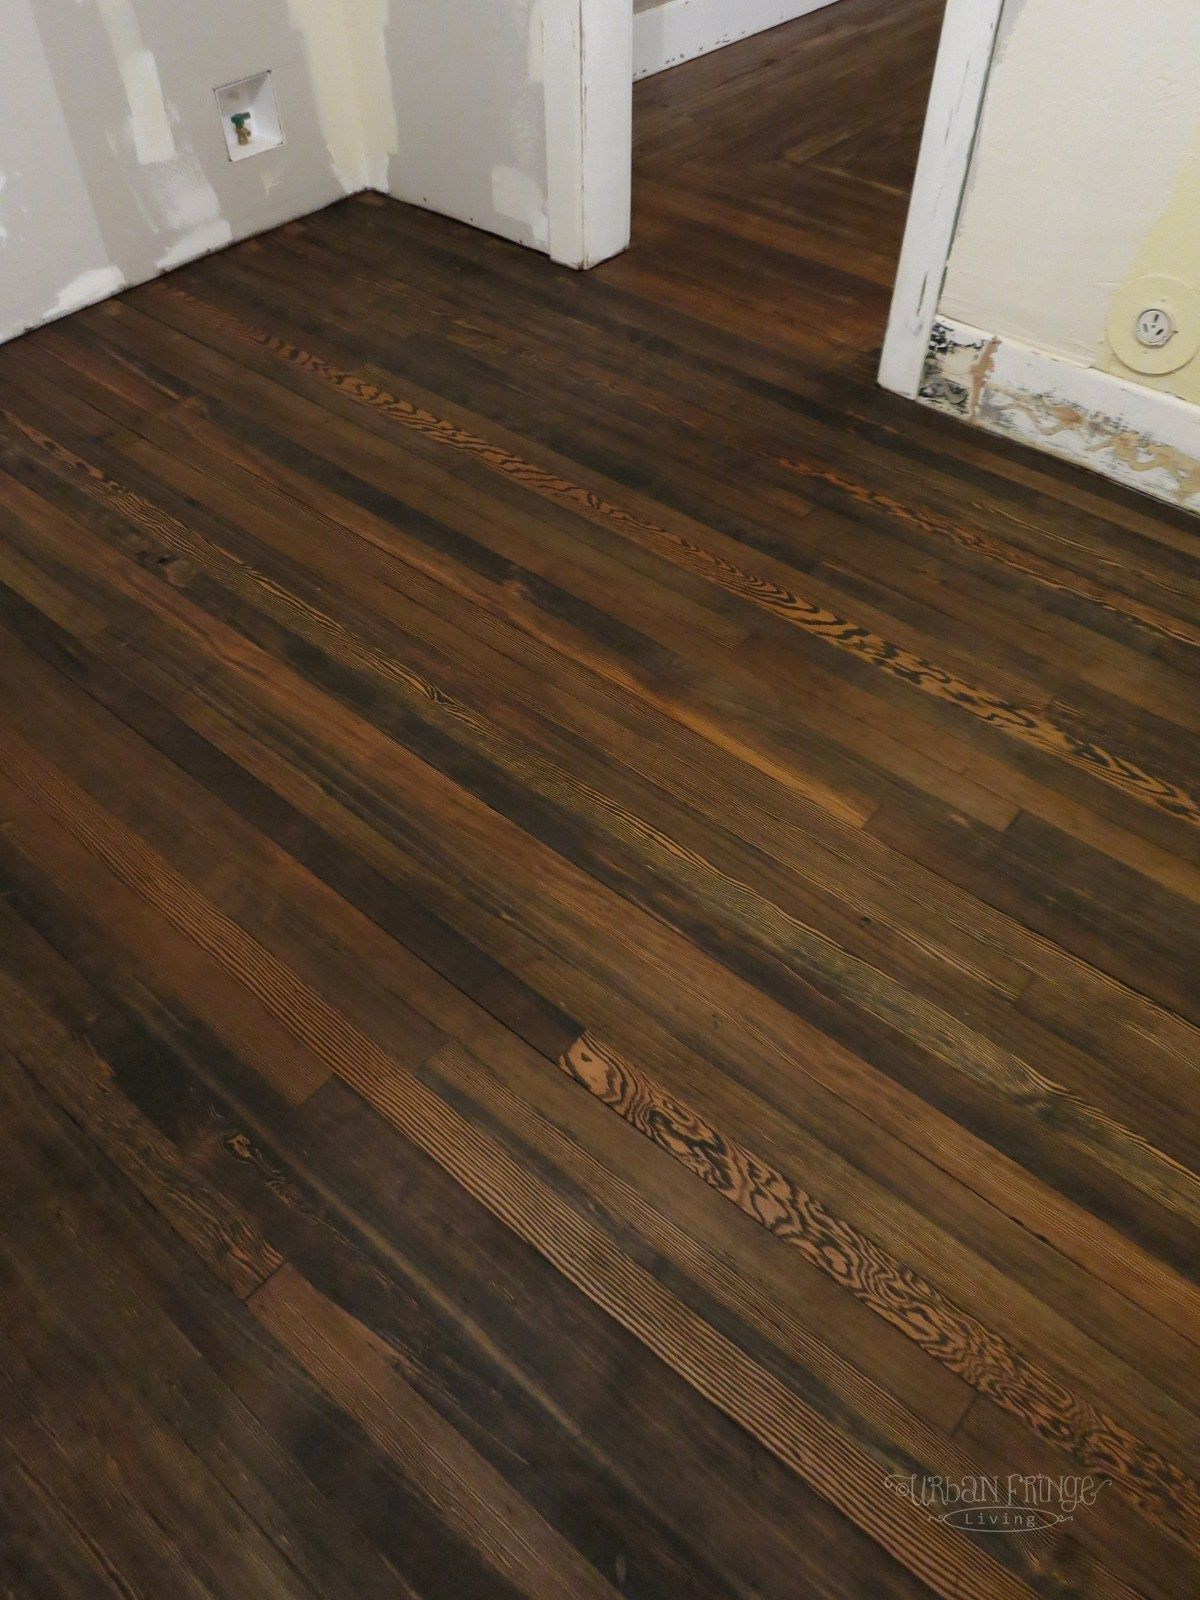 Minwax jacobean on red oak floors google search home for Hardwood floors jacobean